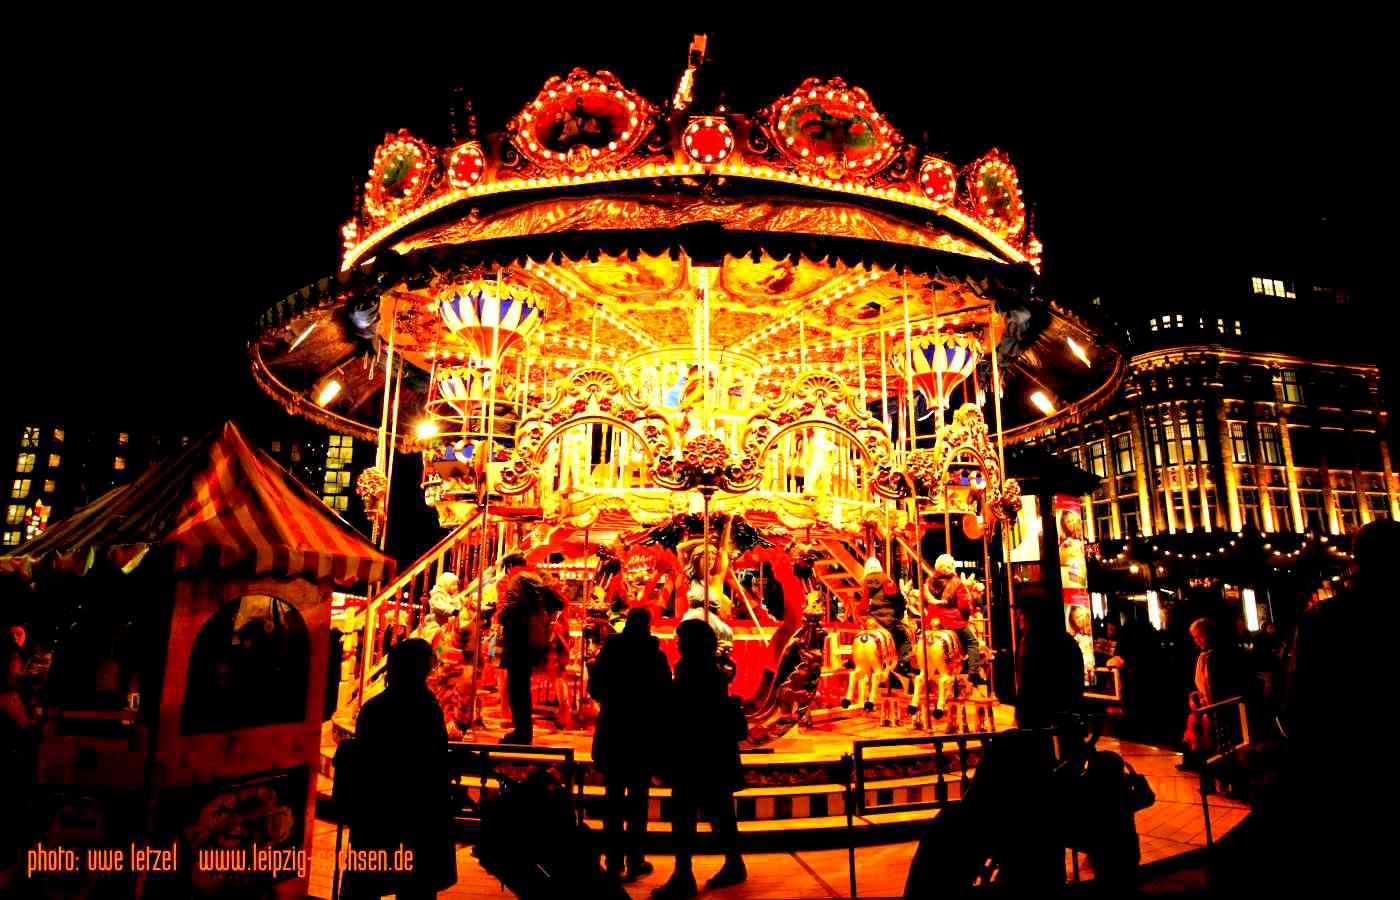 http://www.leipzig-sachsen.de/leipzig/weihnachtsmarkt/leipzig-weihnachtsmarkt_05.jpg